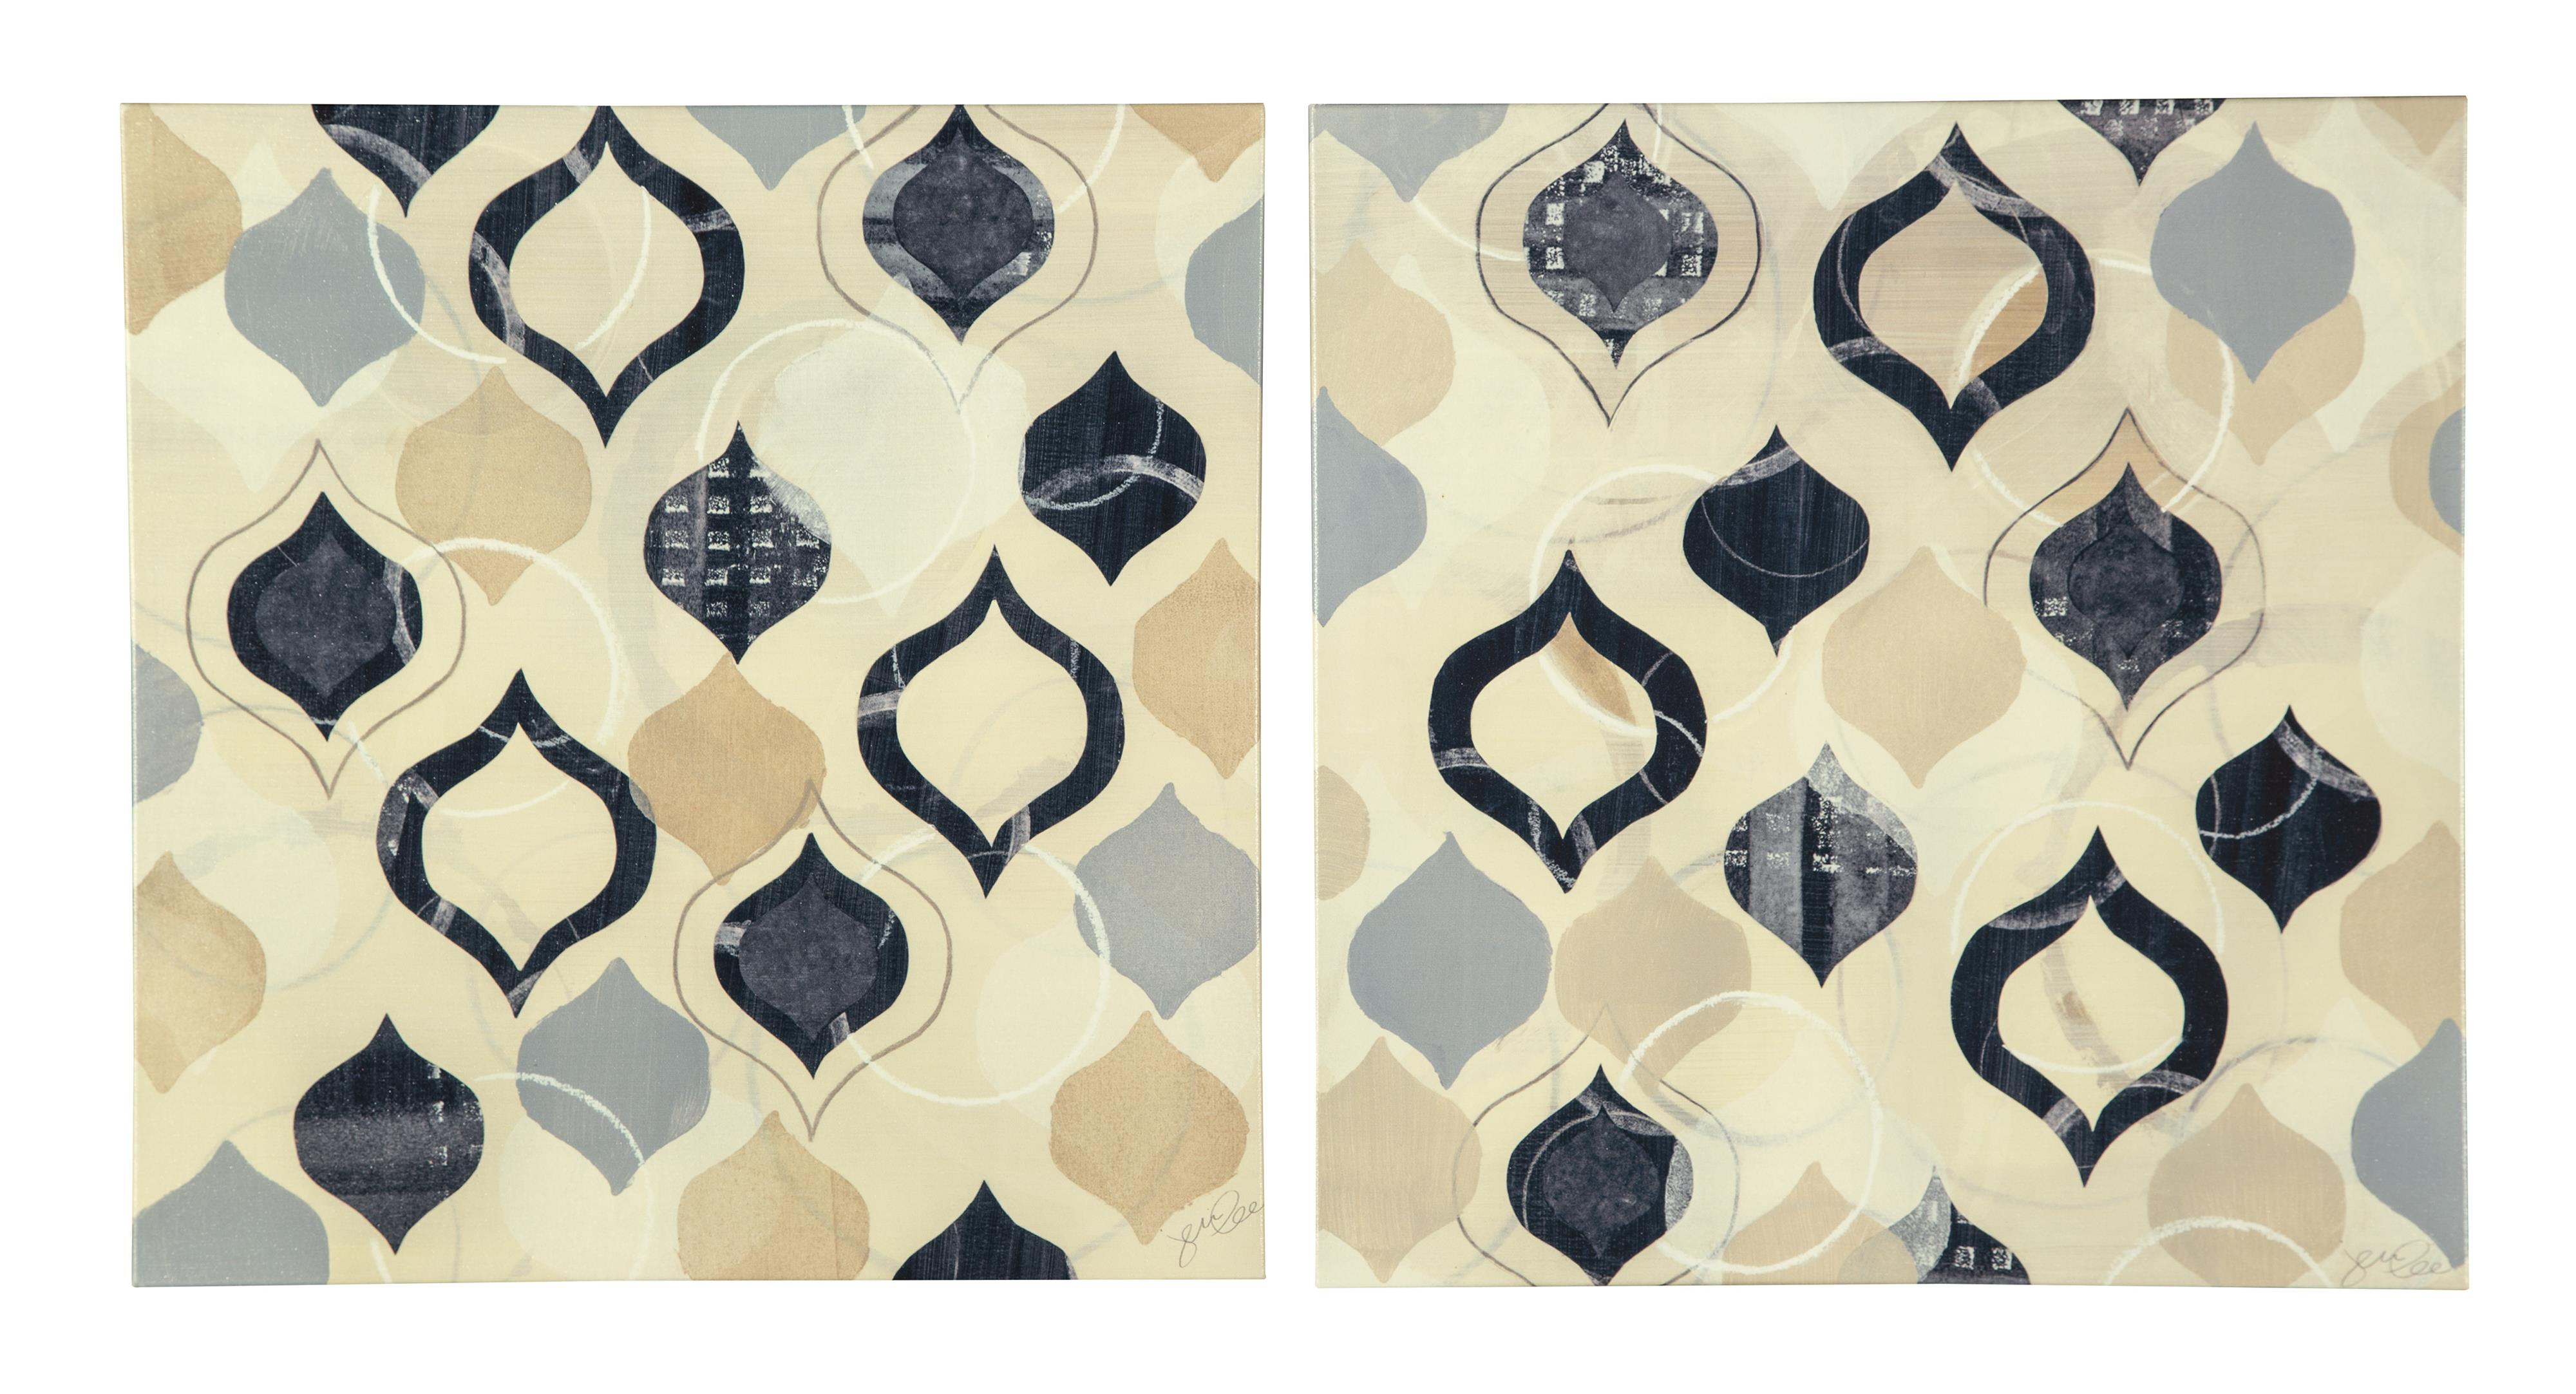 Signature Design by Ashley Wall Art Beacher (Multi) - Wall Art Set - Item Number: A8000119